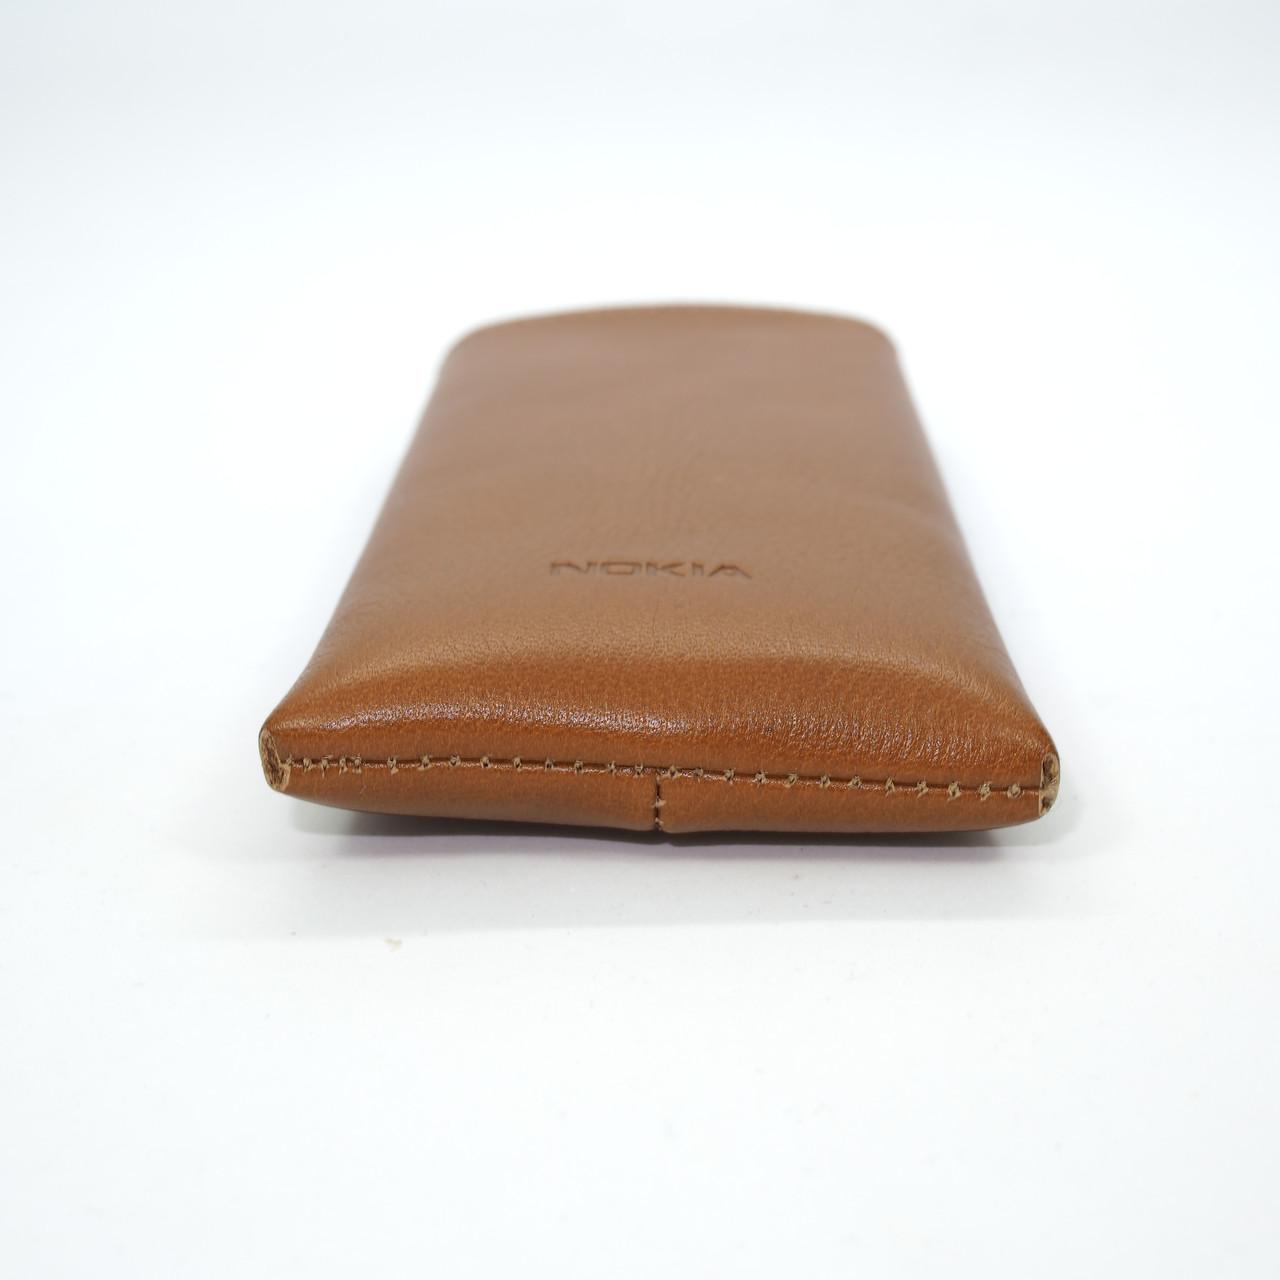 Nokia CP-553 N9 Brawn Для телефона